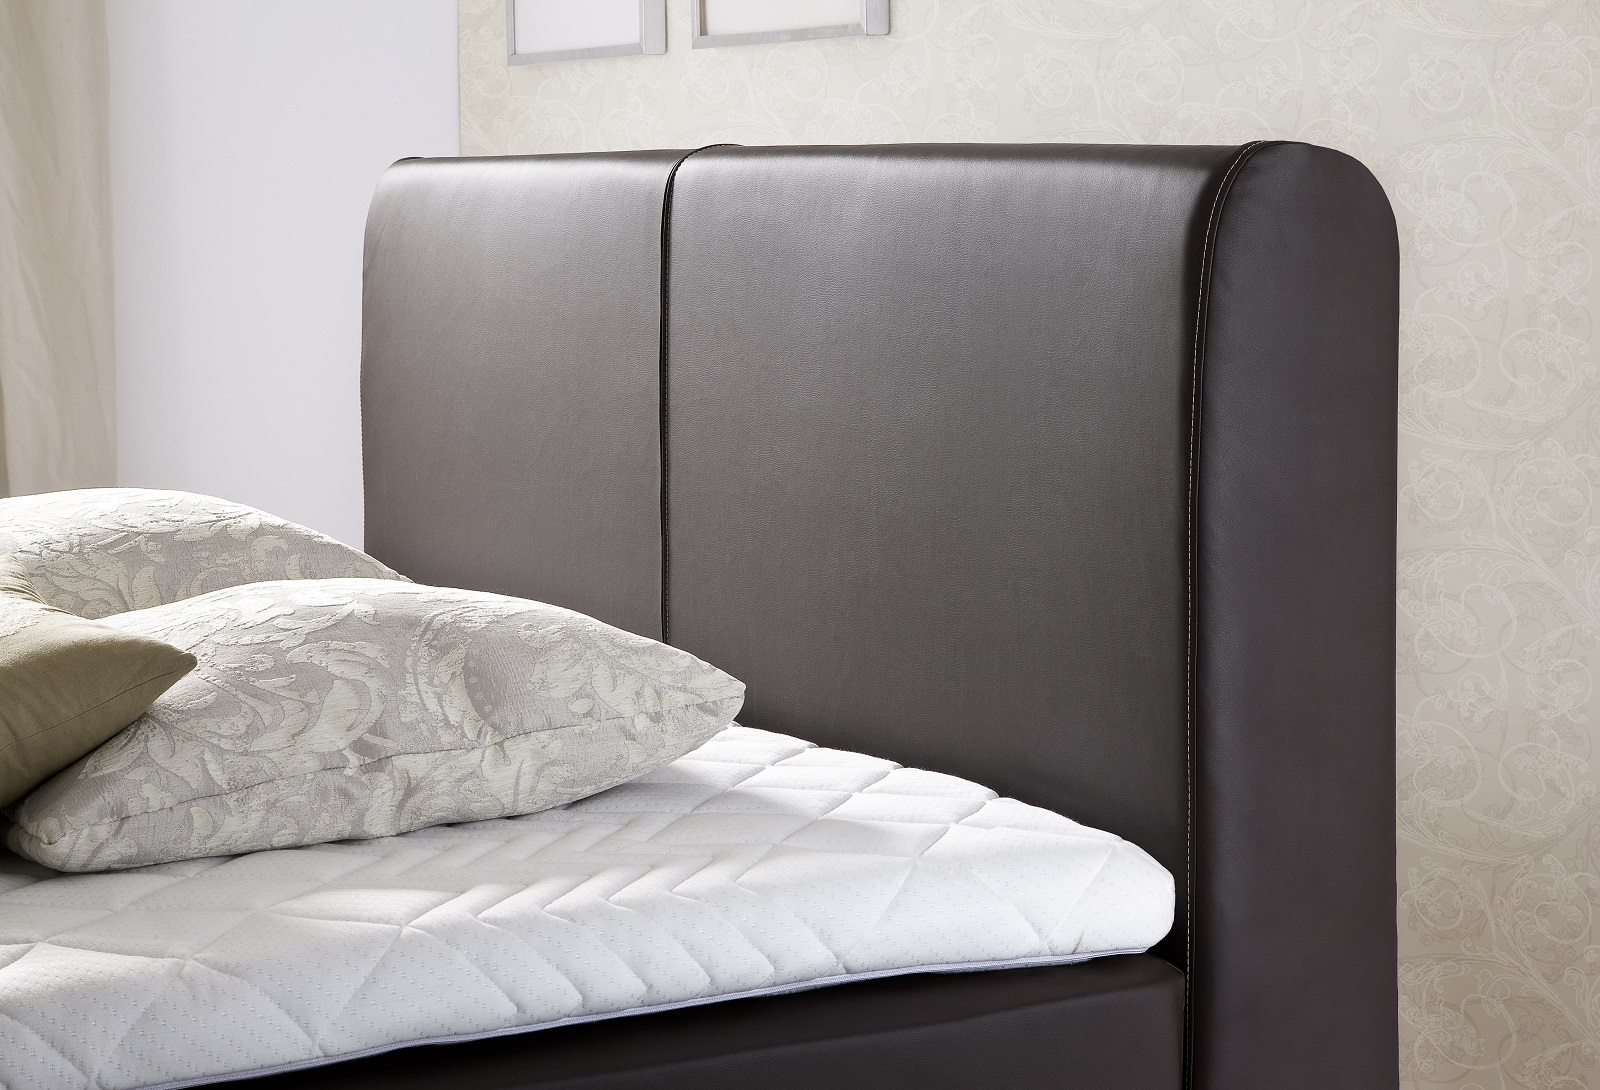 boxspringbett amondo braun 160cm x 200cm. Black Bedroom Furniture Sets. Home Design Ideas